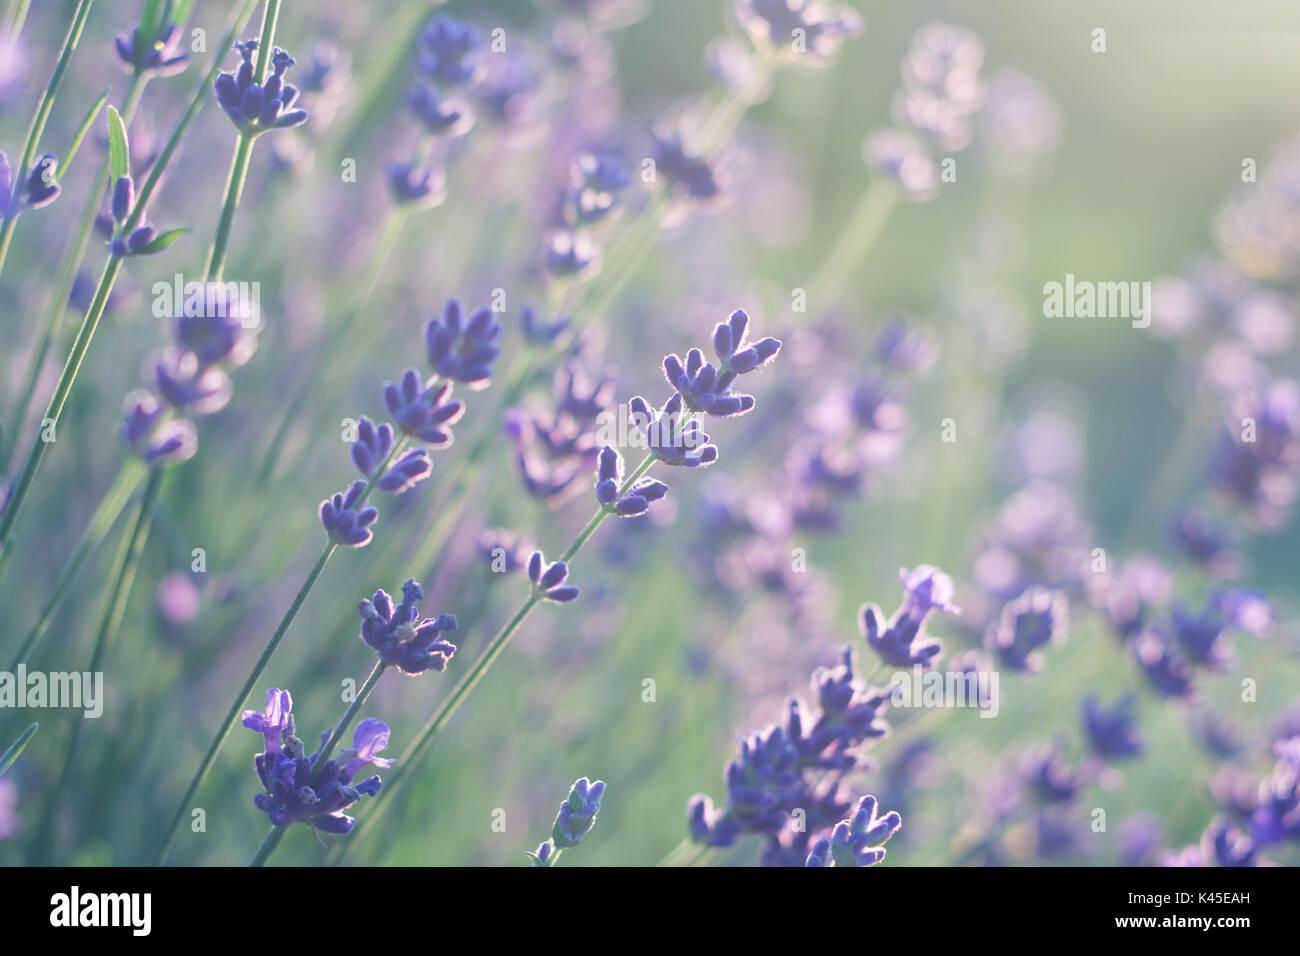 lavender in soft light - Stock Image